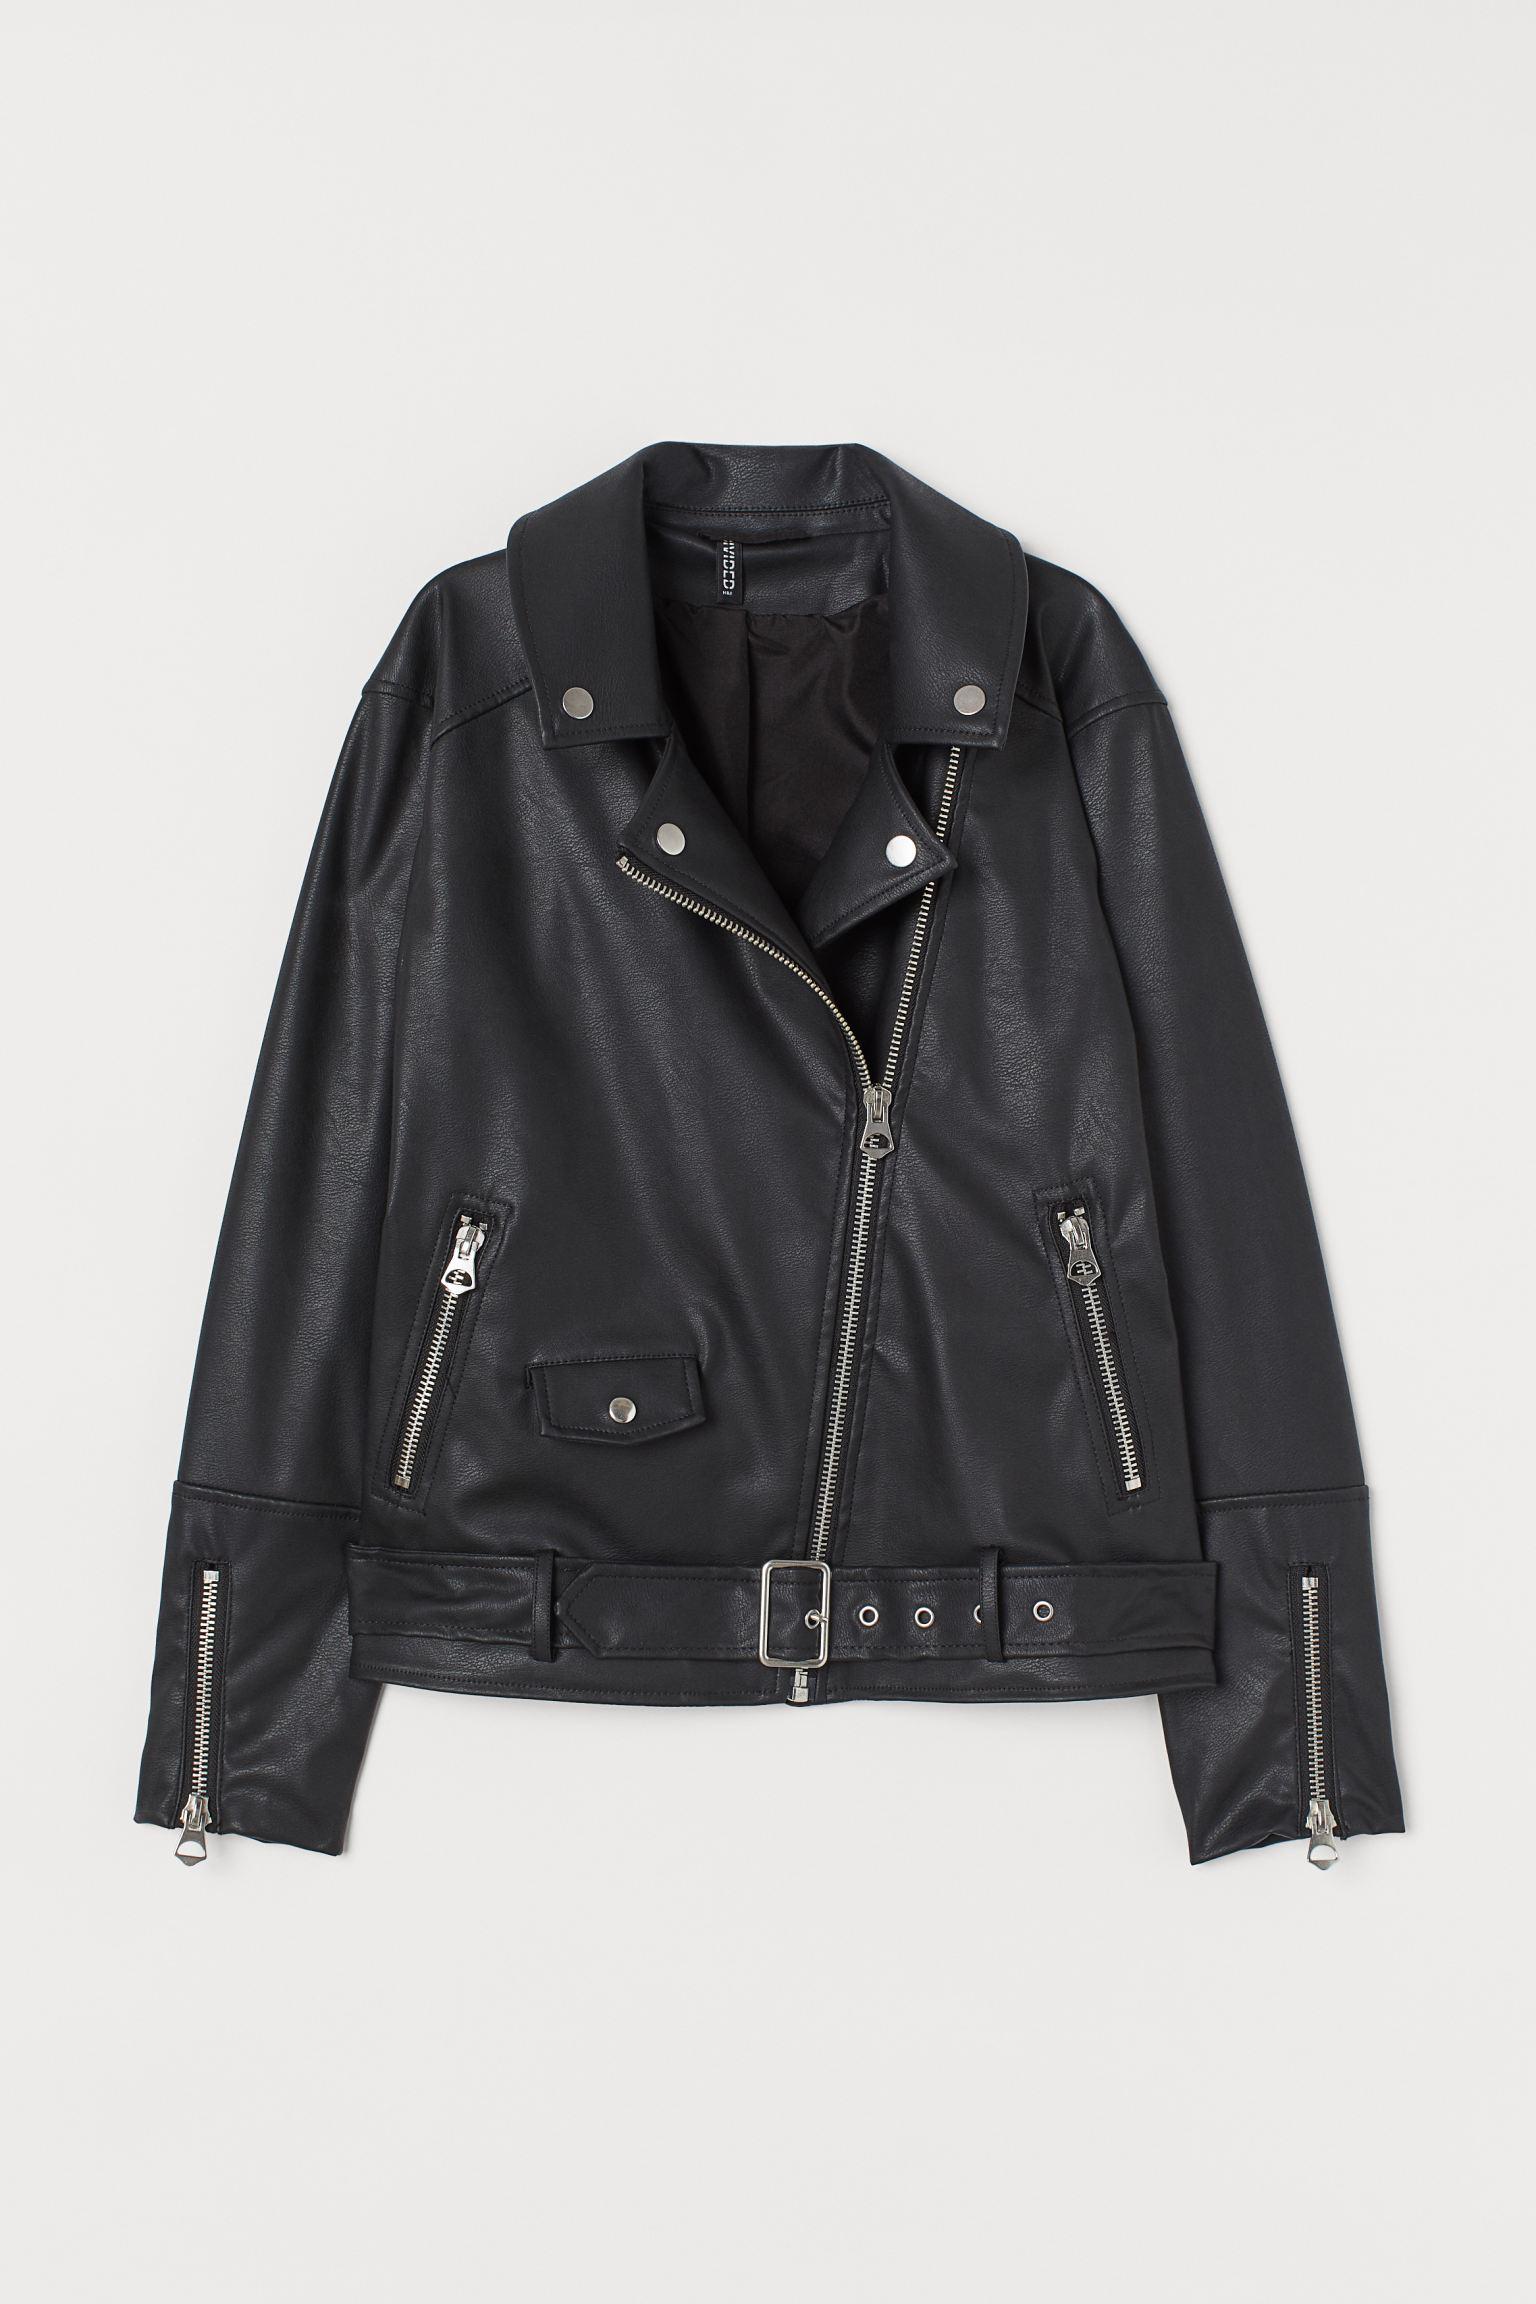 Fake leather biker jacket with oversize design